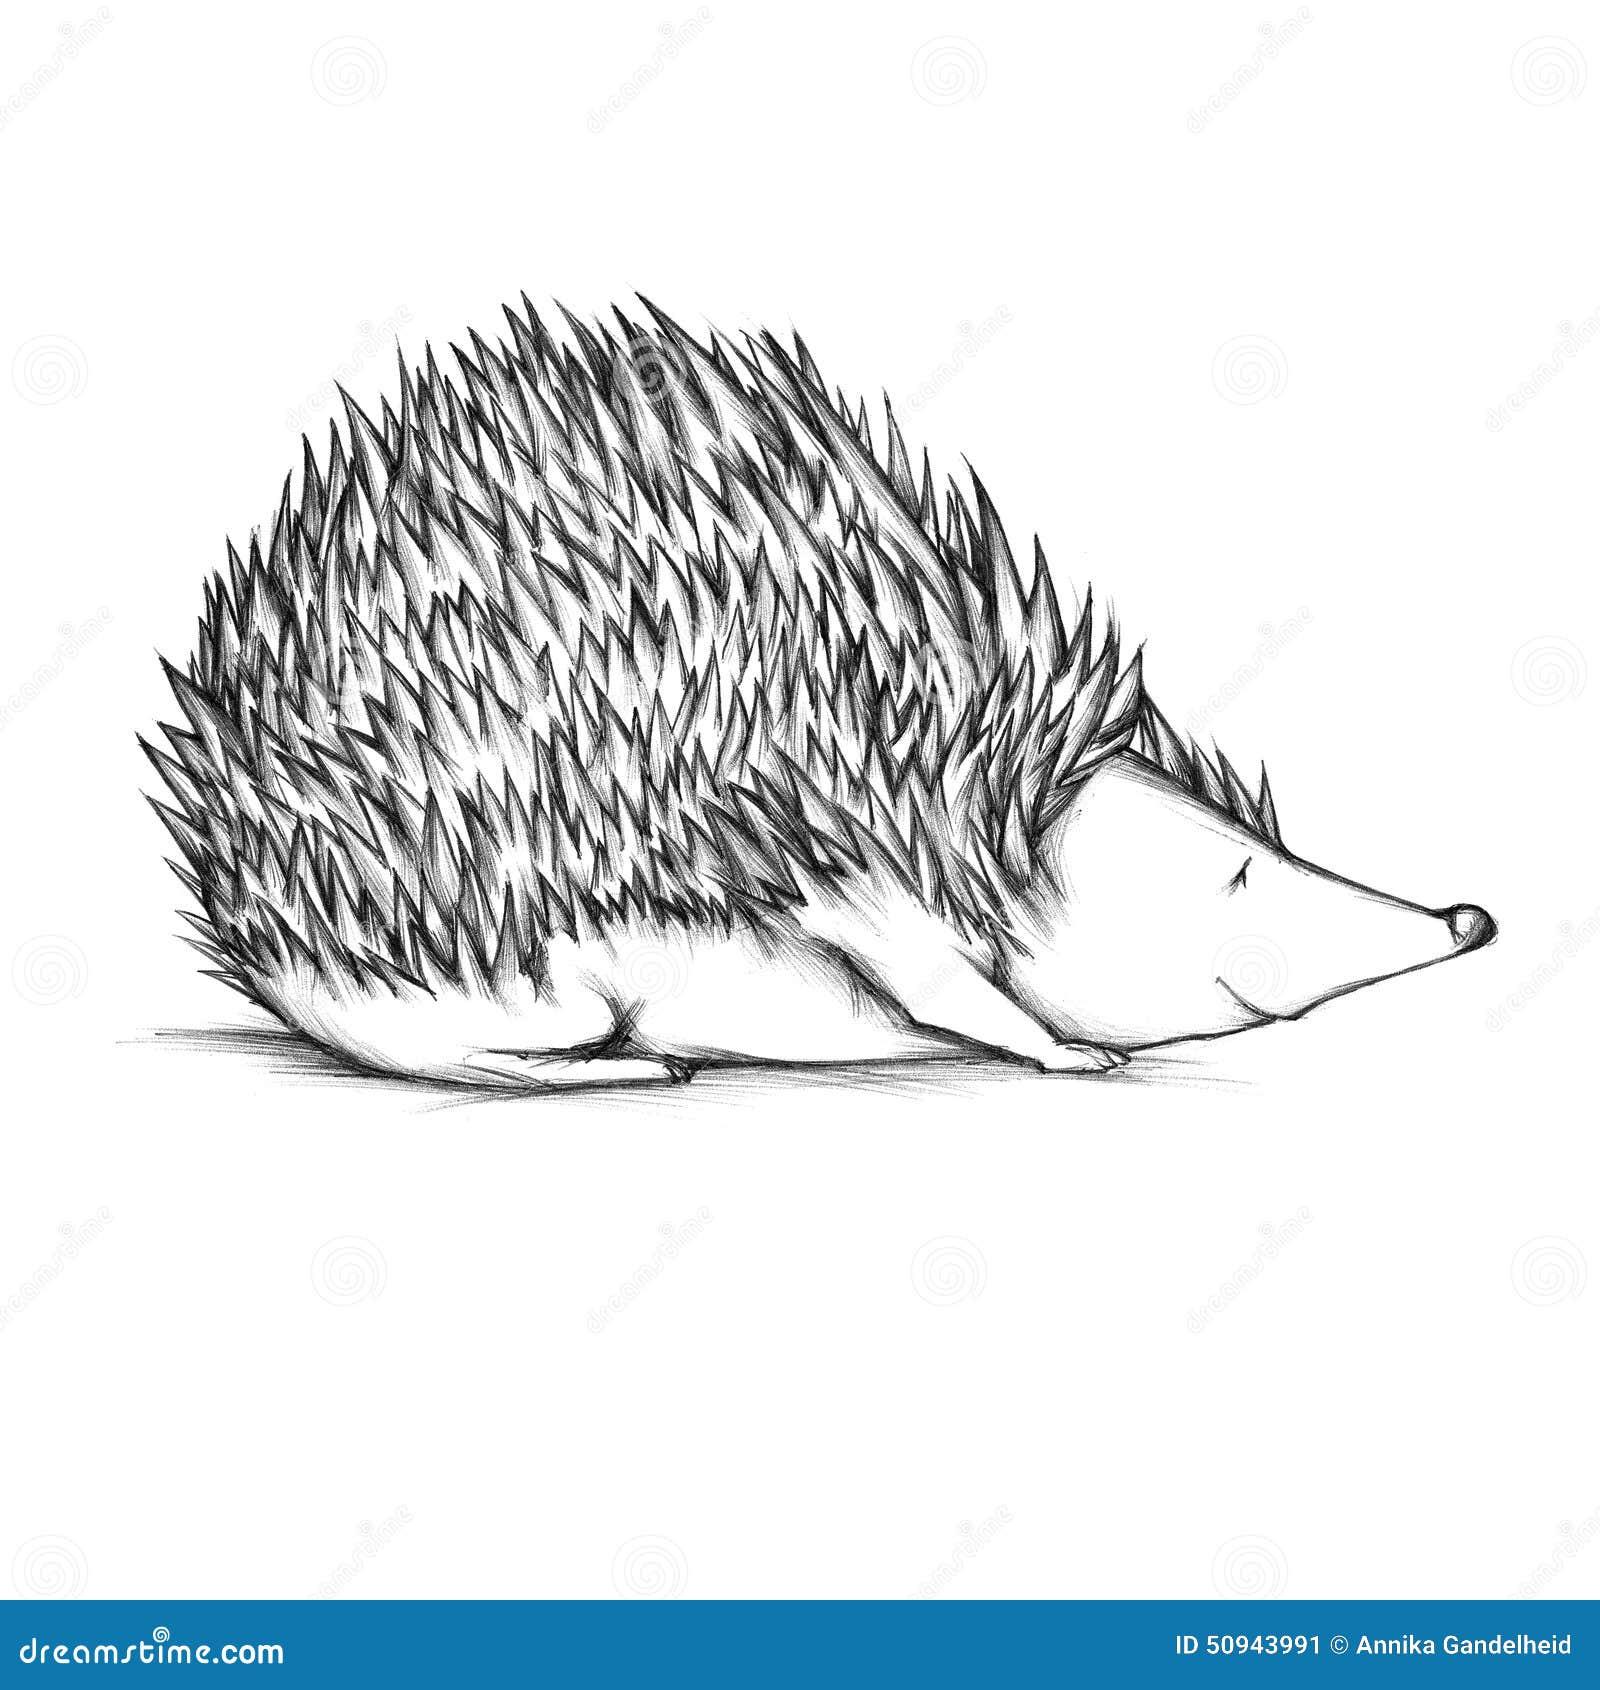 Drawn Hedgehog Stock Illustration - Image: 50943991